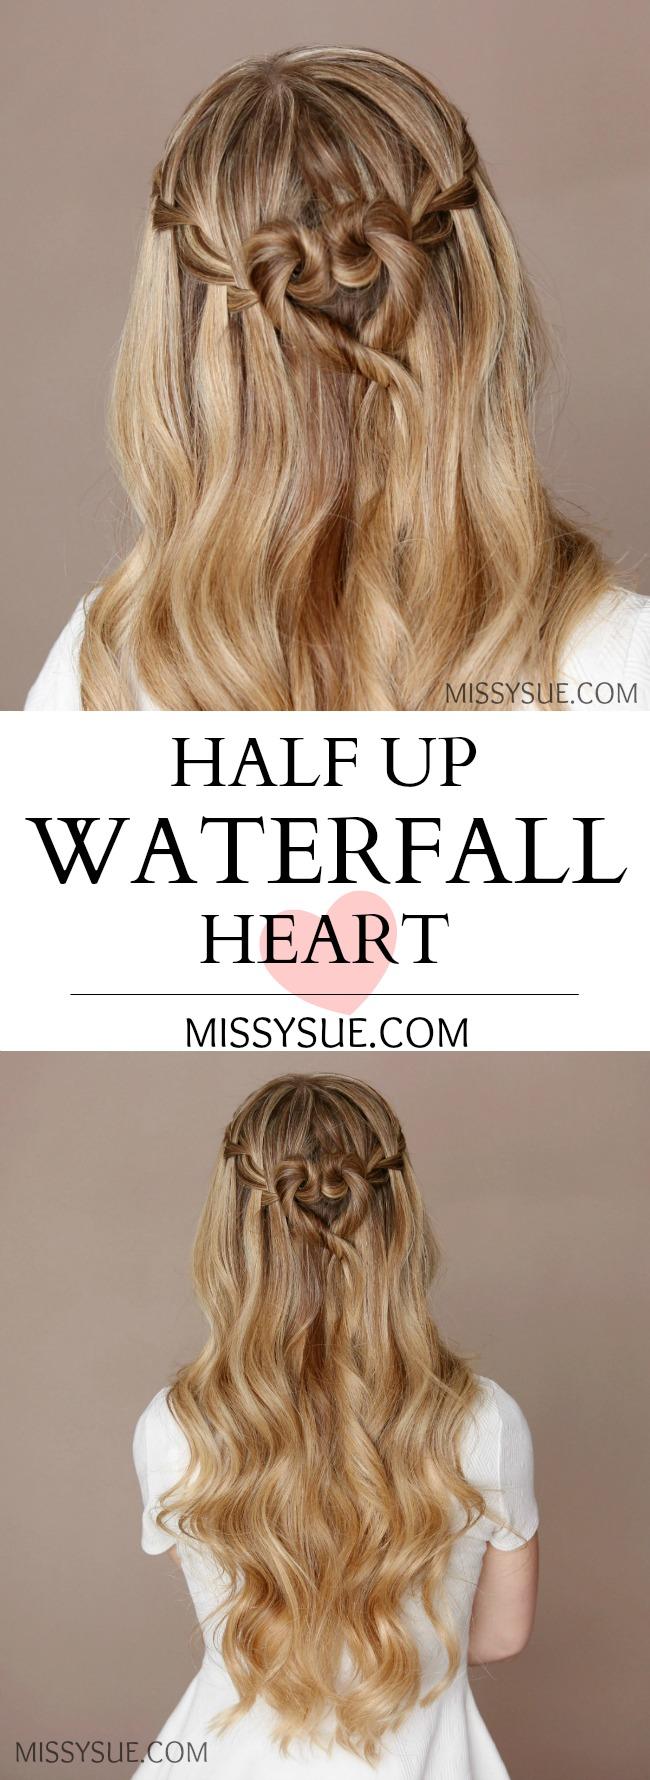 Half Up Waterfall Heart